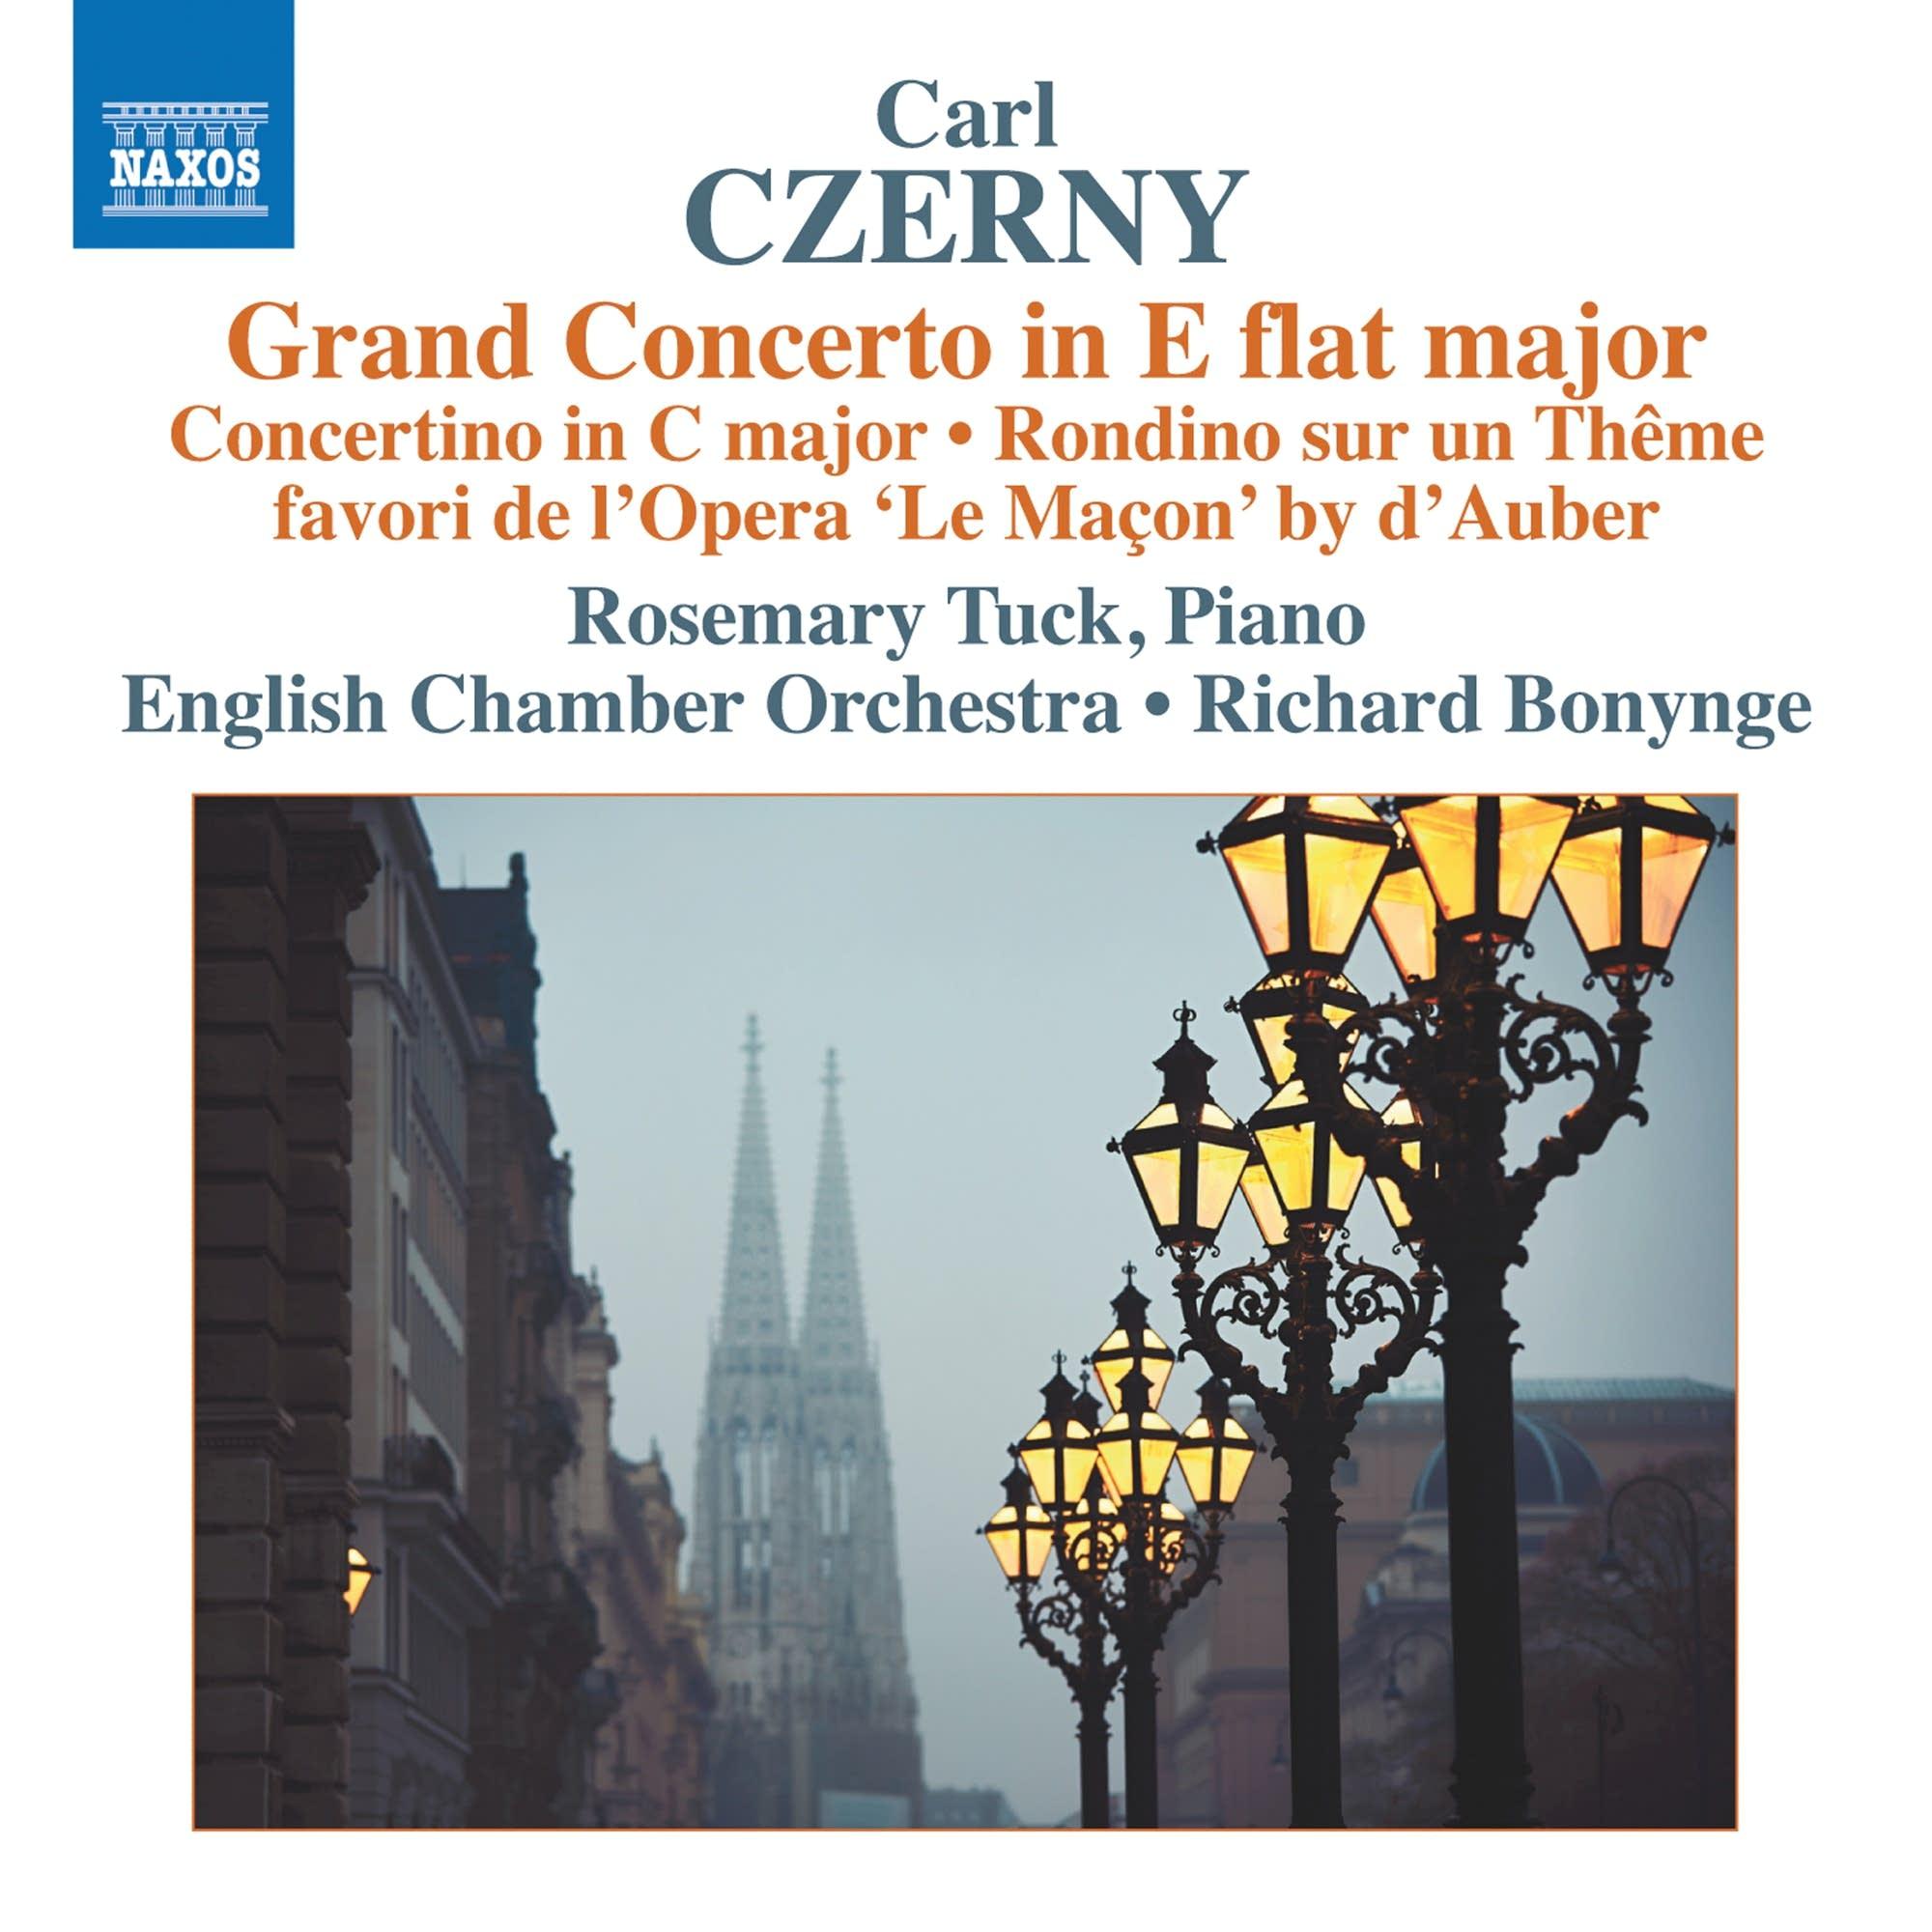 Carl Czerny - Rondino sur un Theme Favori de l'Opera Le Macon d'Auber